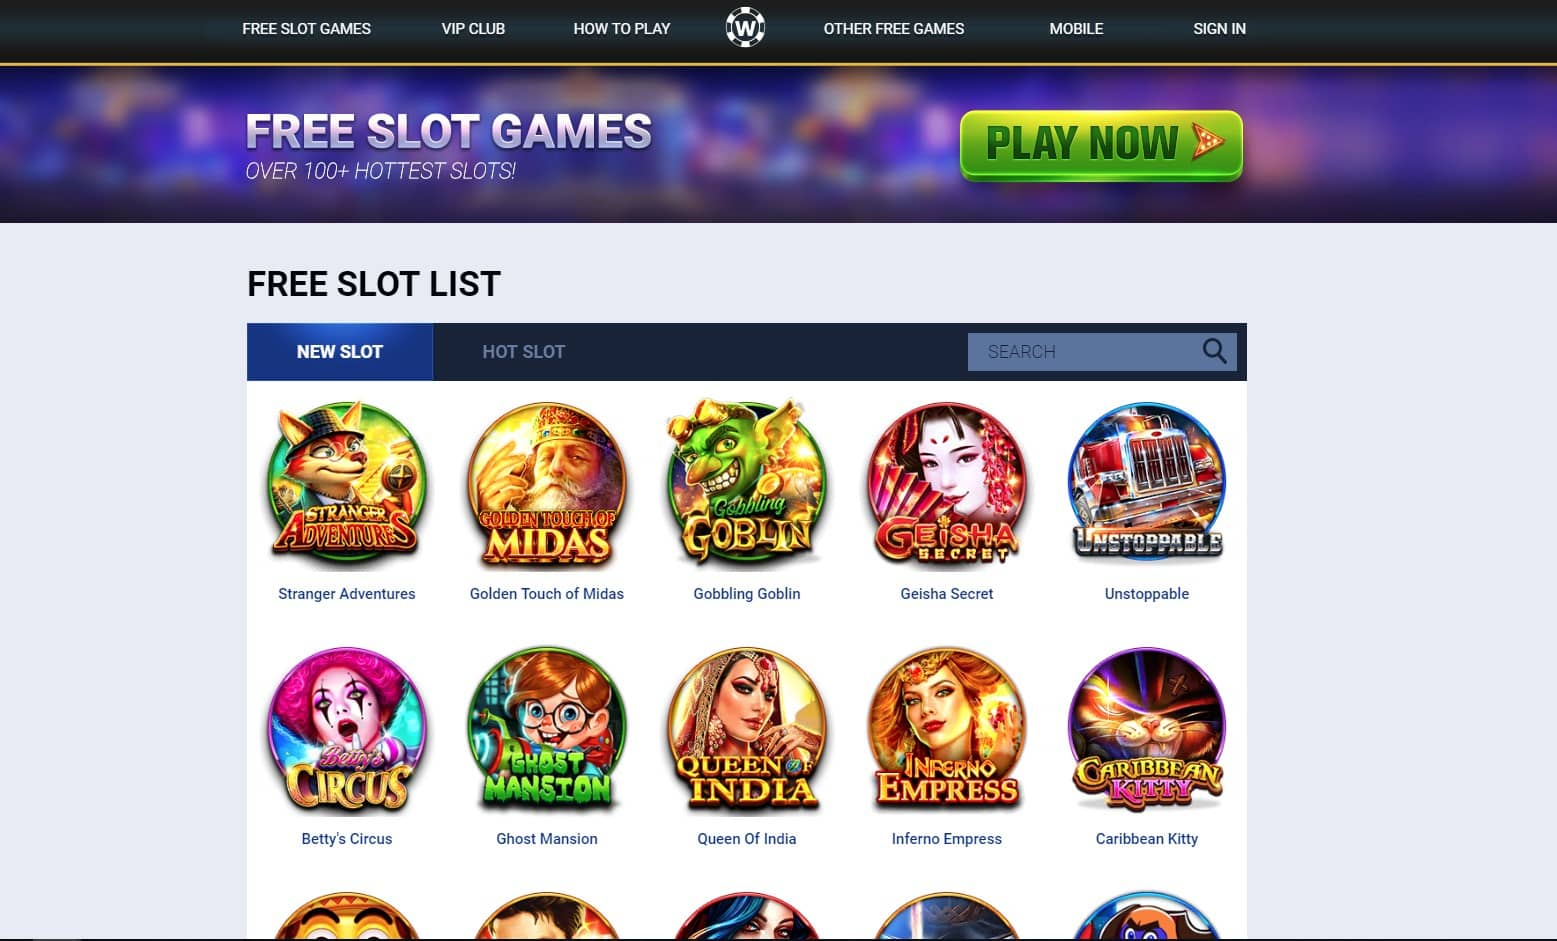 Doubleu Casino Online Casino Claim 100 Bonus And Play Casino Games Online At Netbet